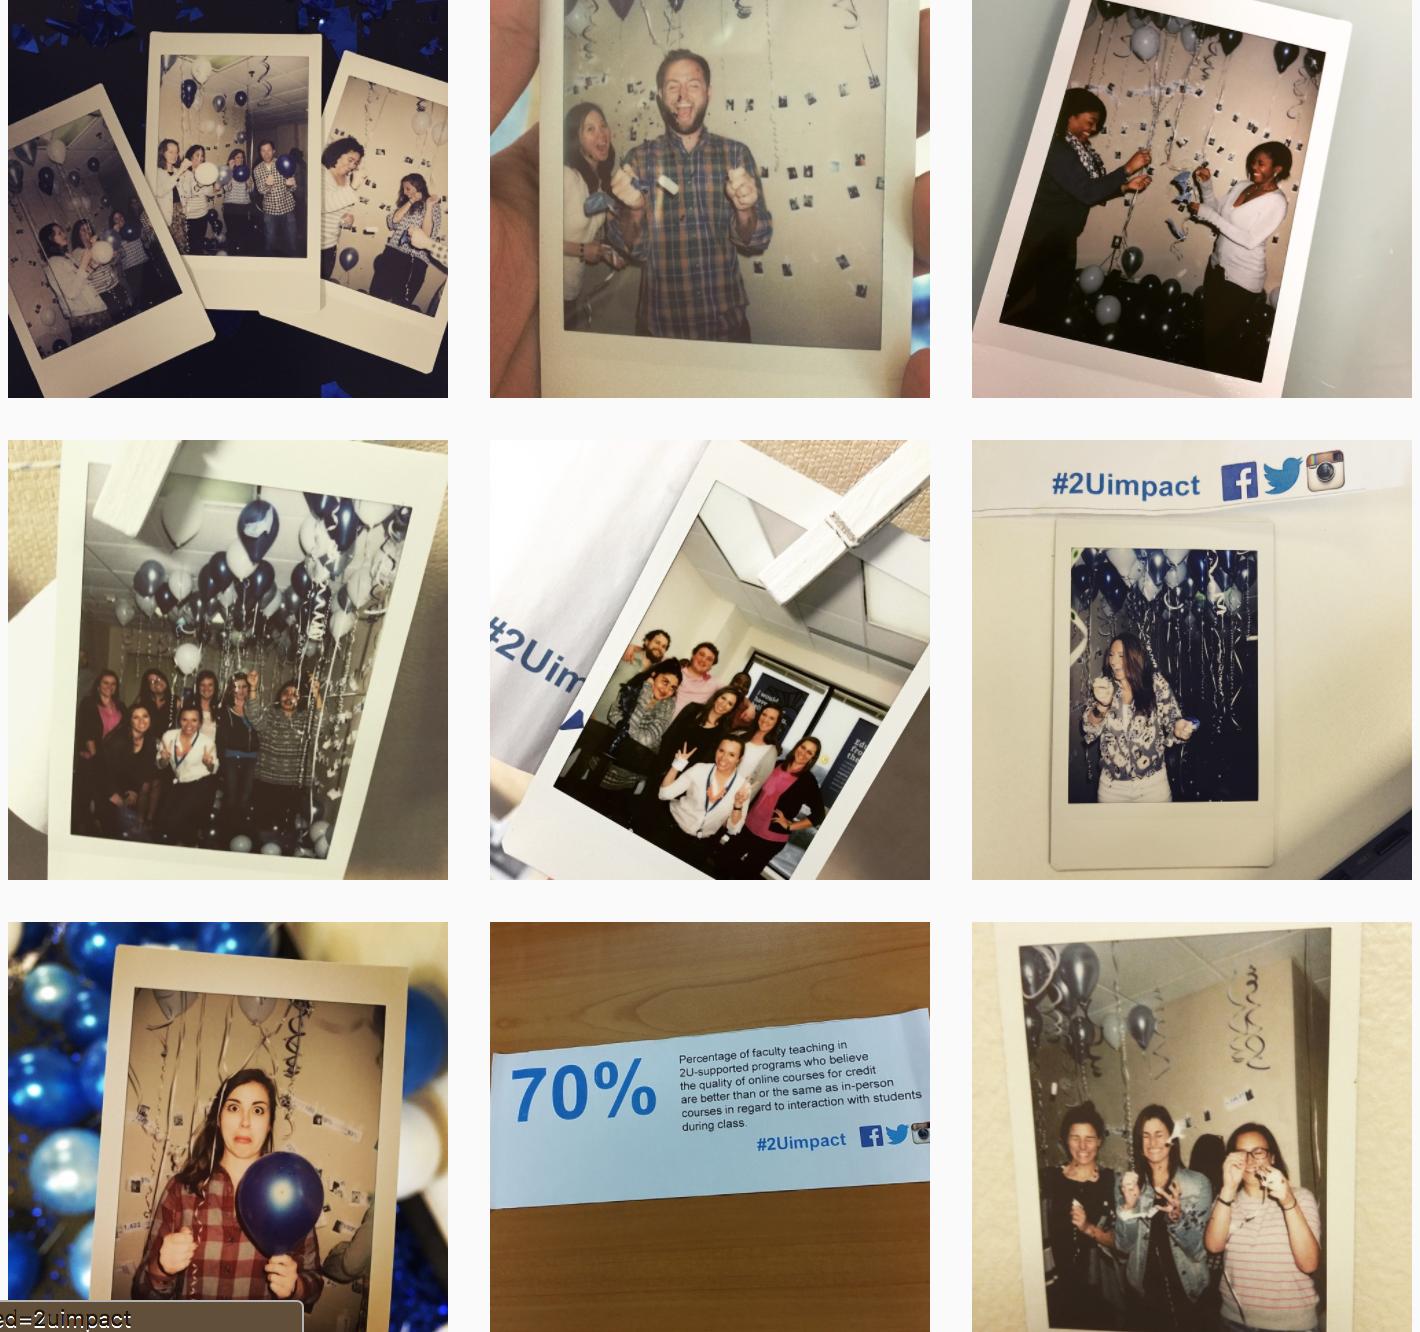 Instagram-posts-2u-impact-event.png